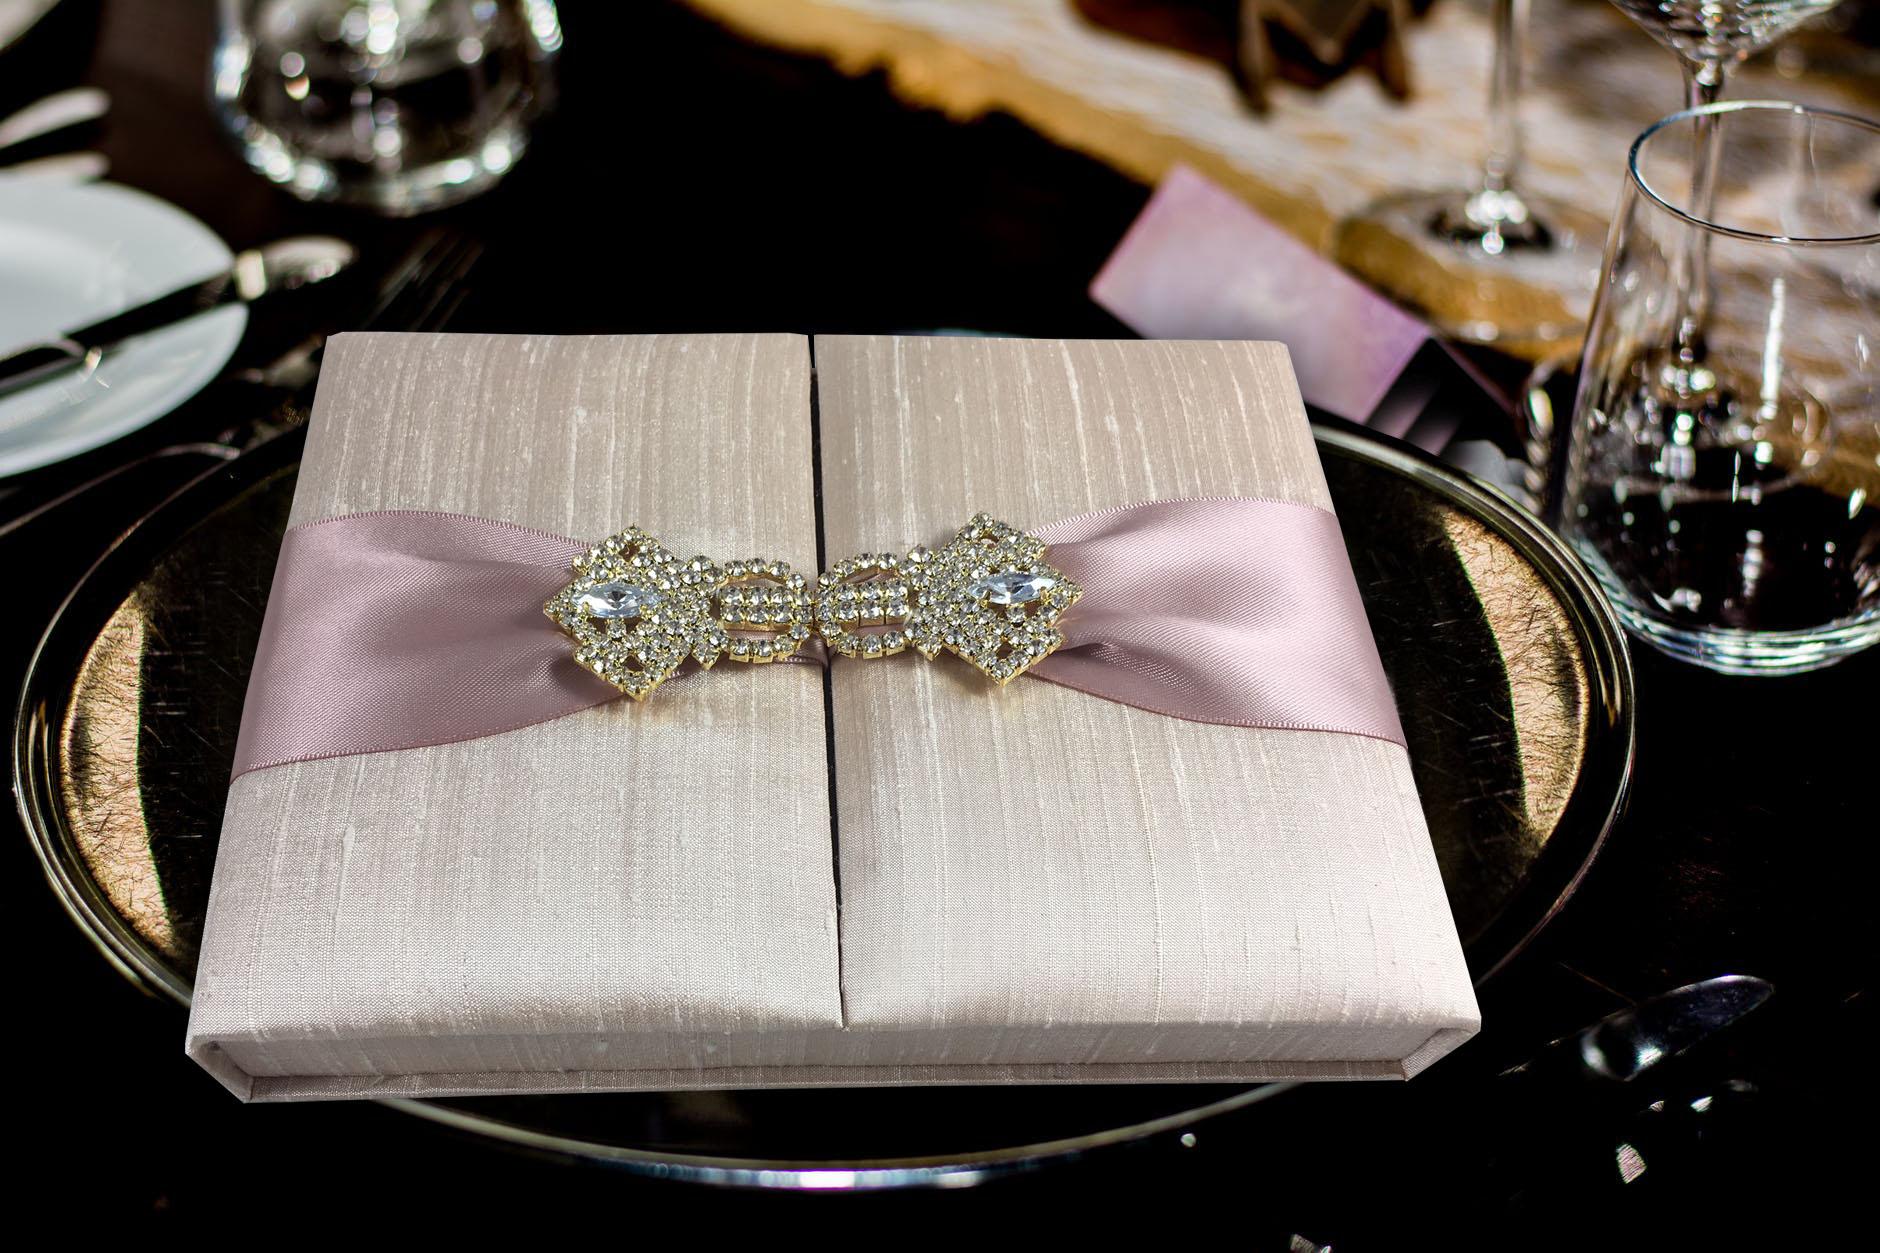 The original Thai silk box for wedding invitations